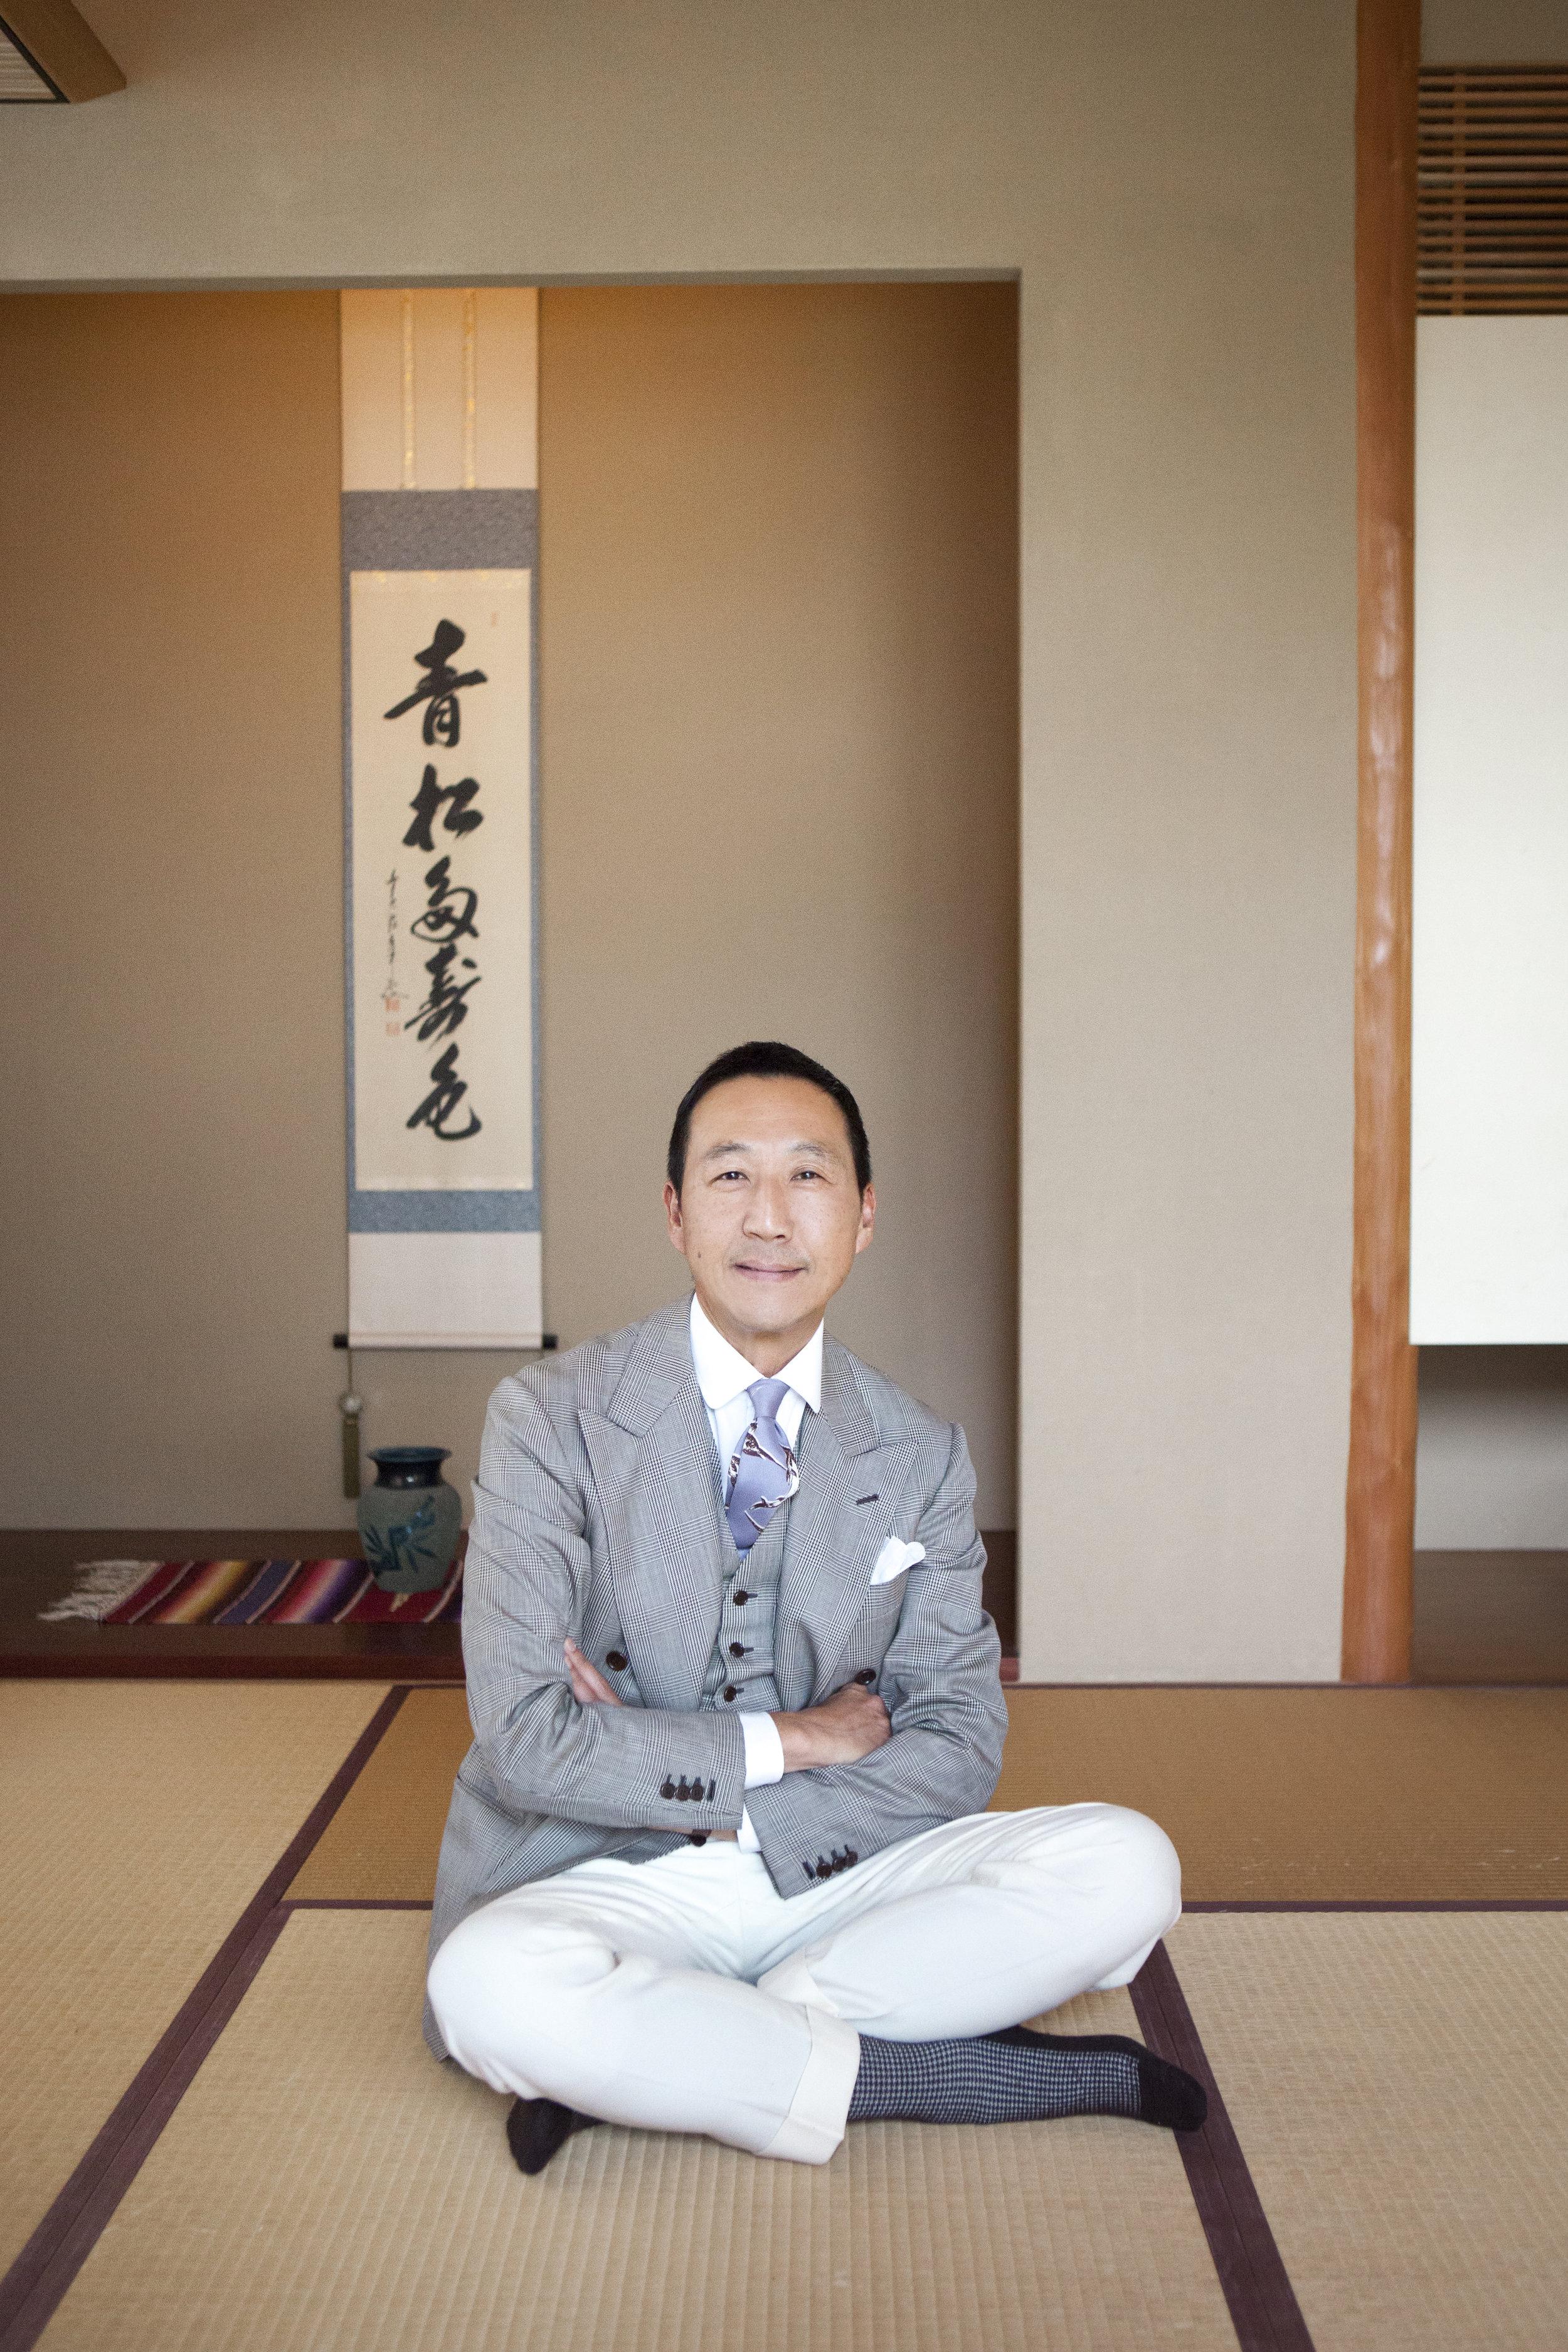 Yasuto Kamoshita of United Arrows